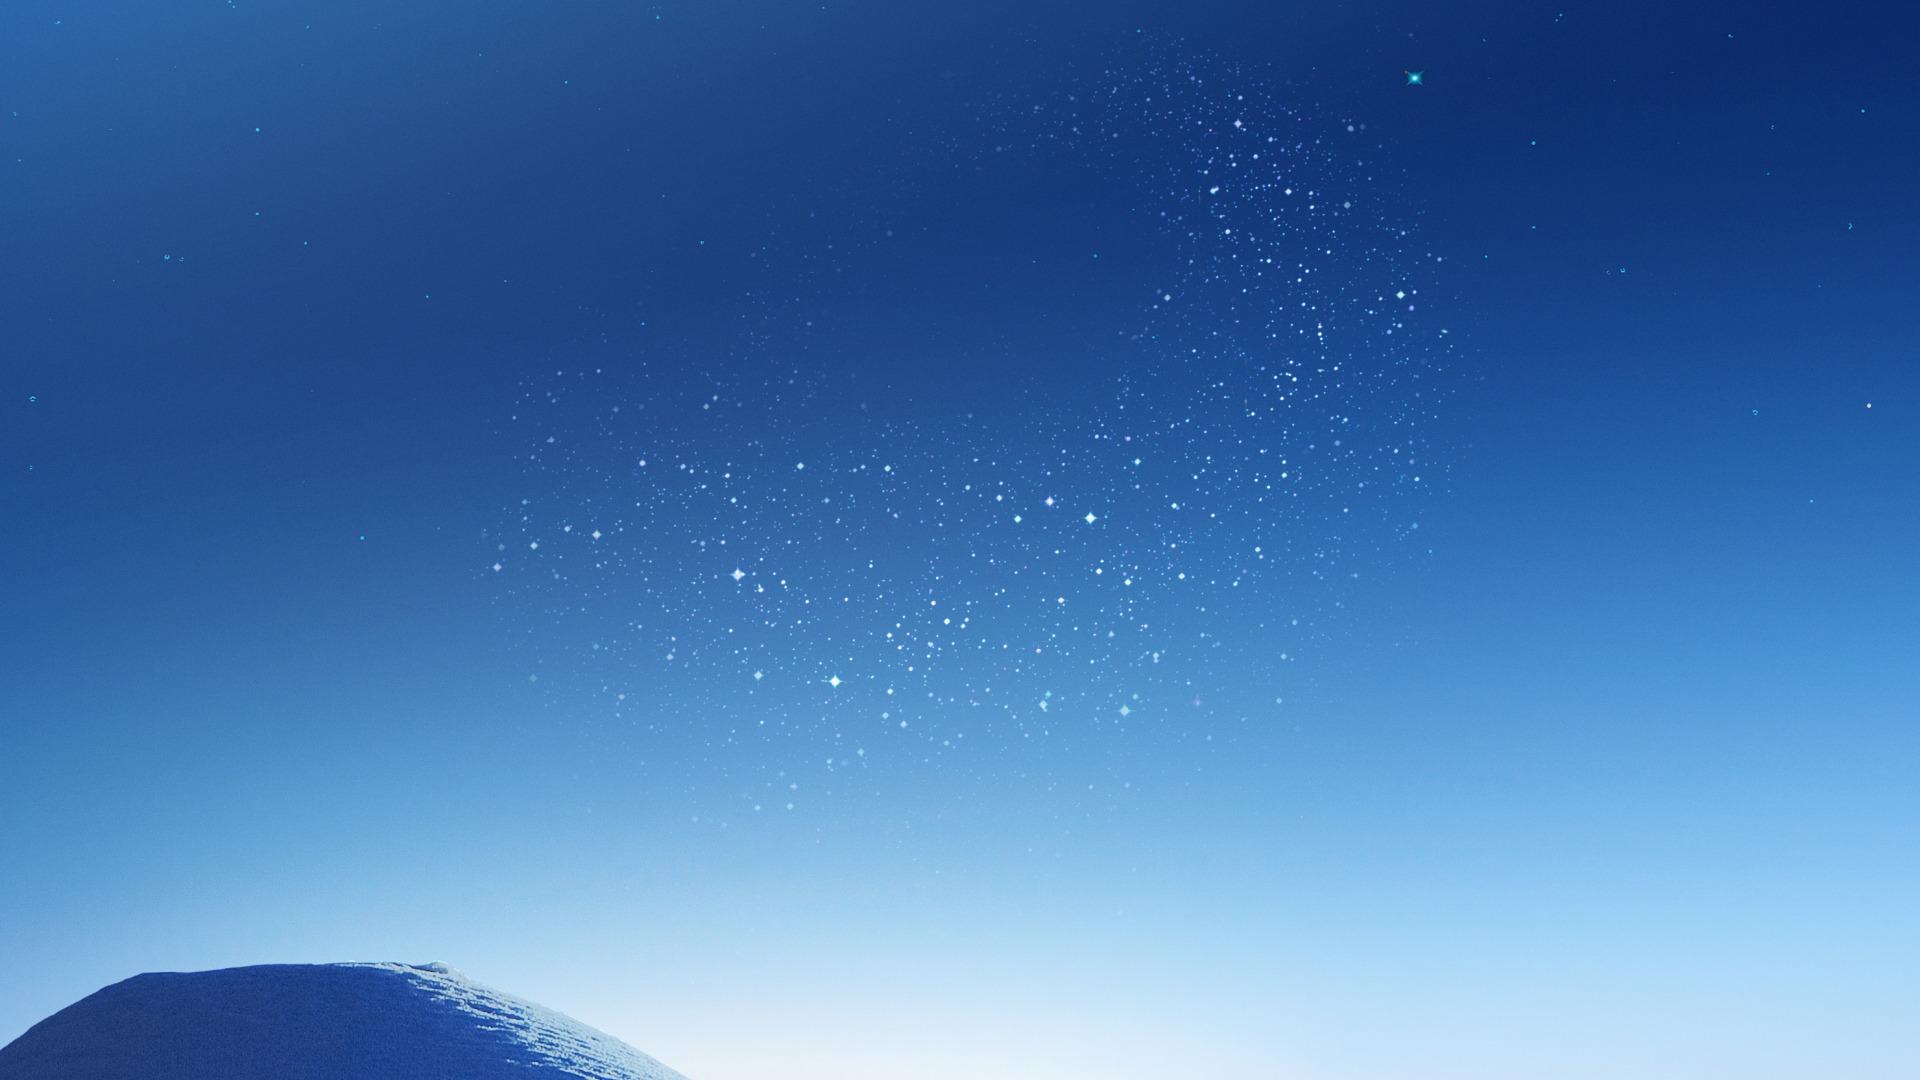 samsung galaxy s4 wallpaper download